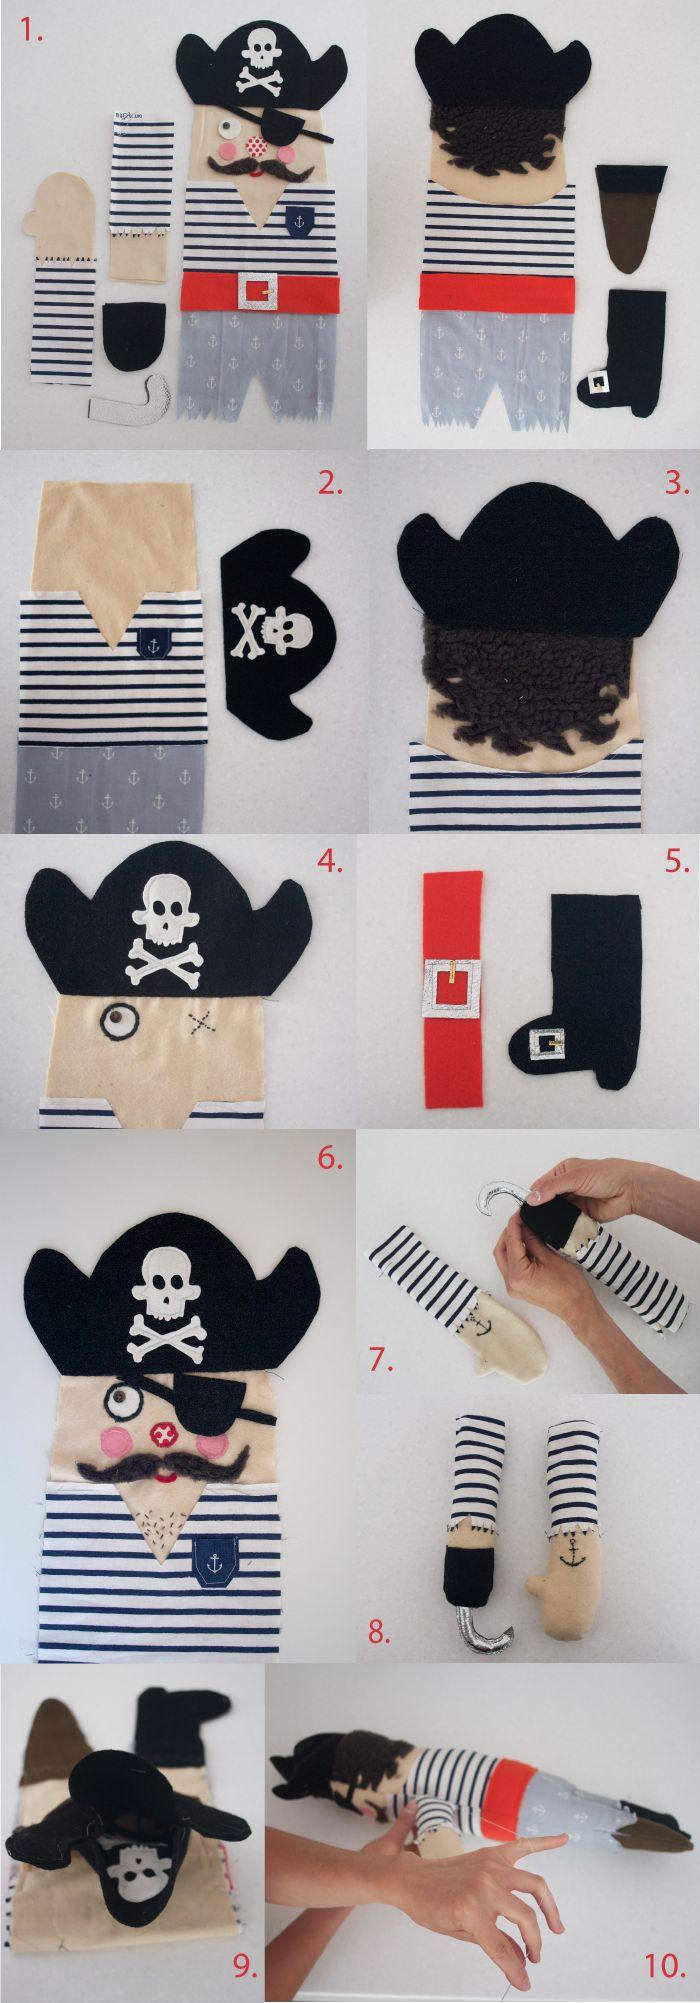 pirate doll